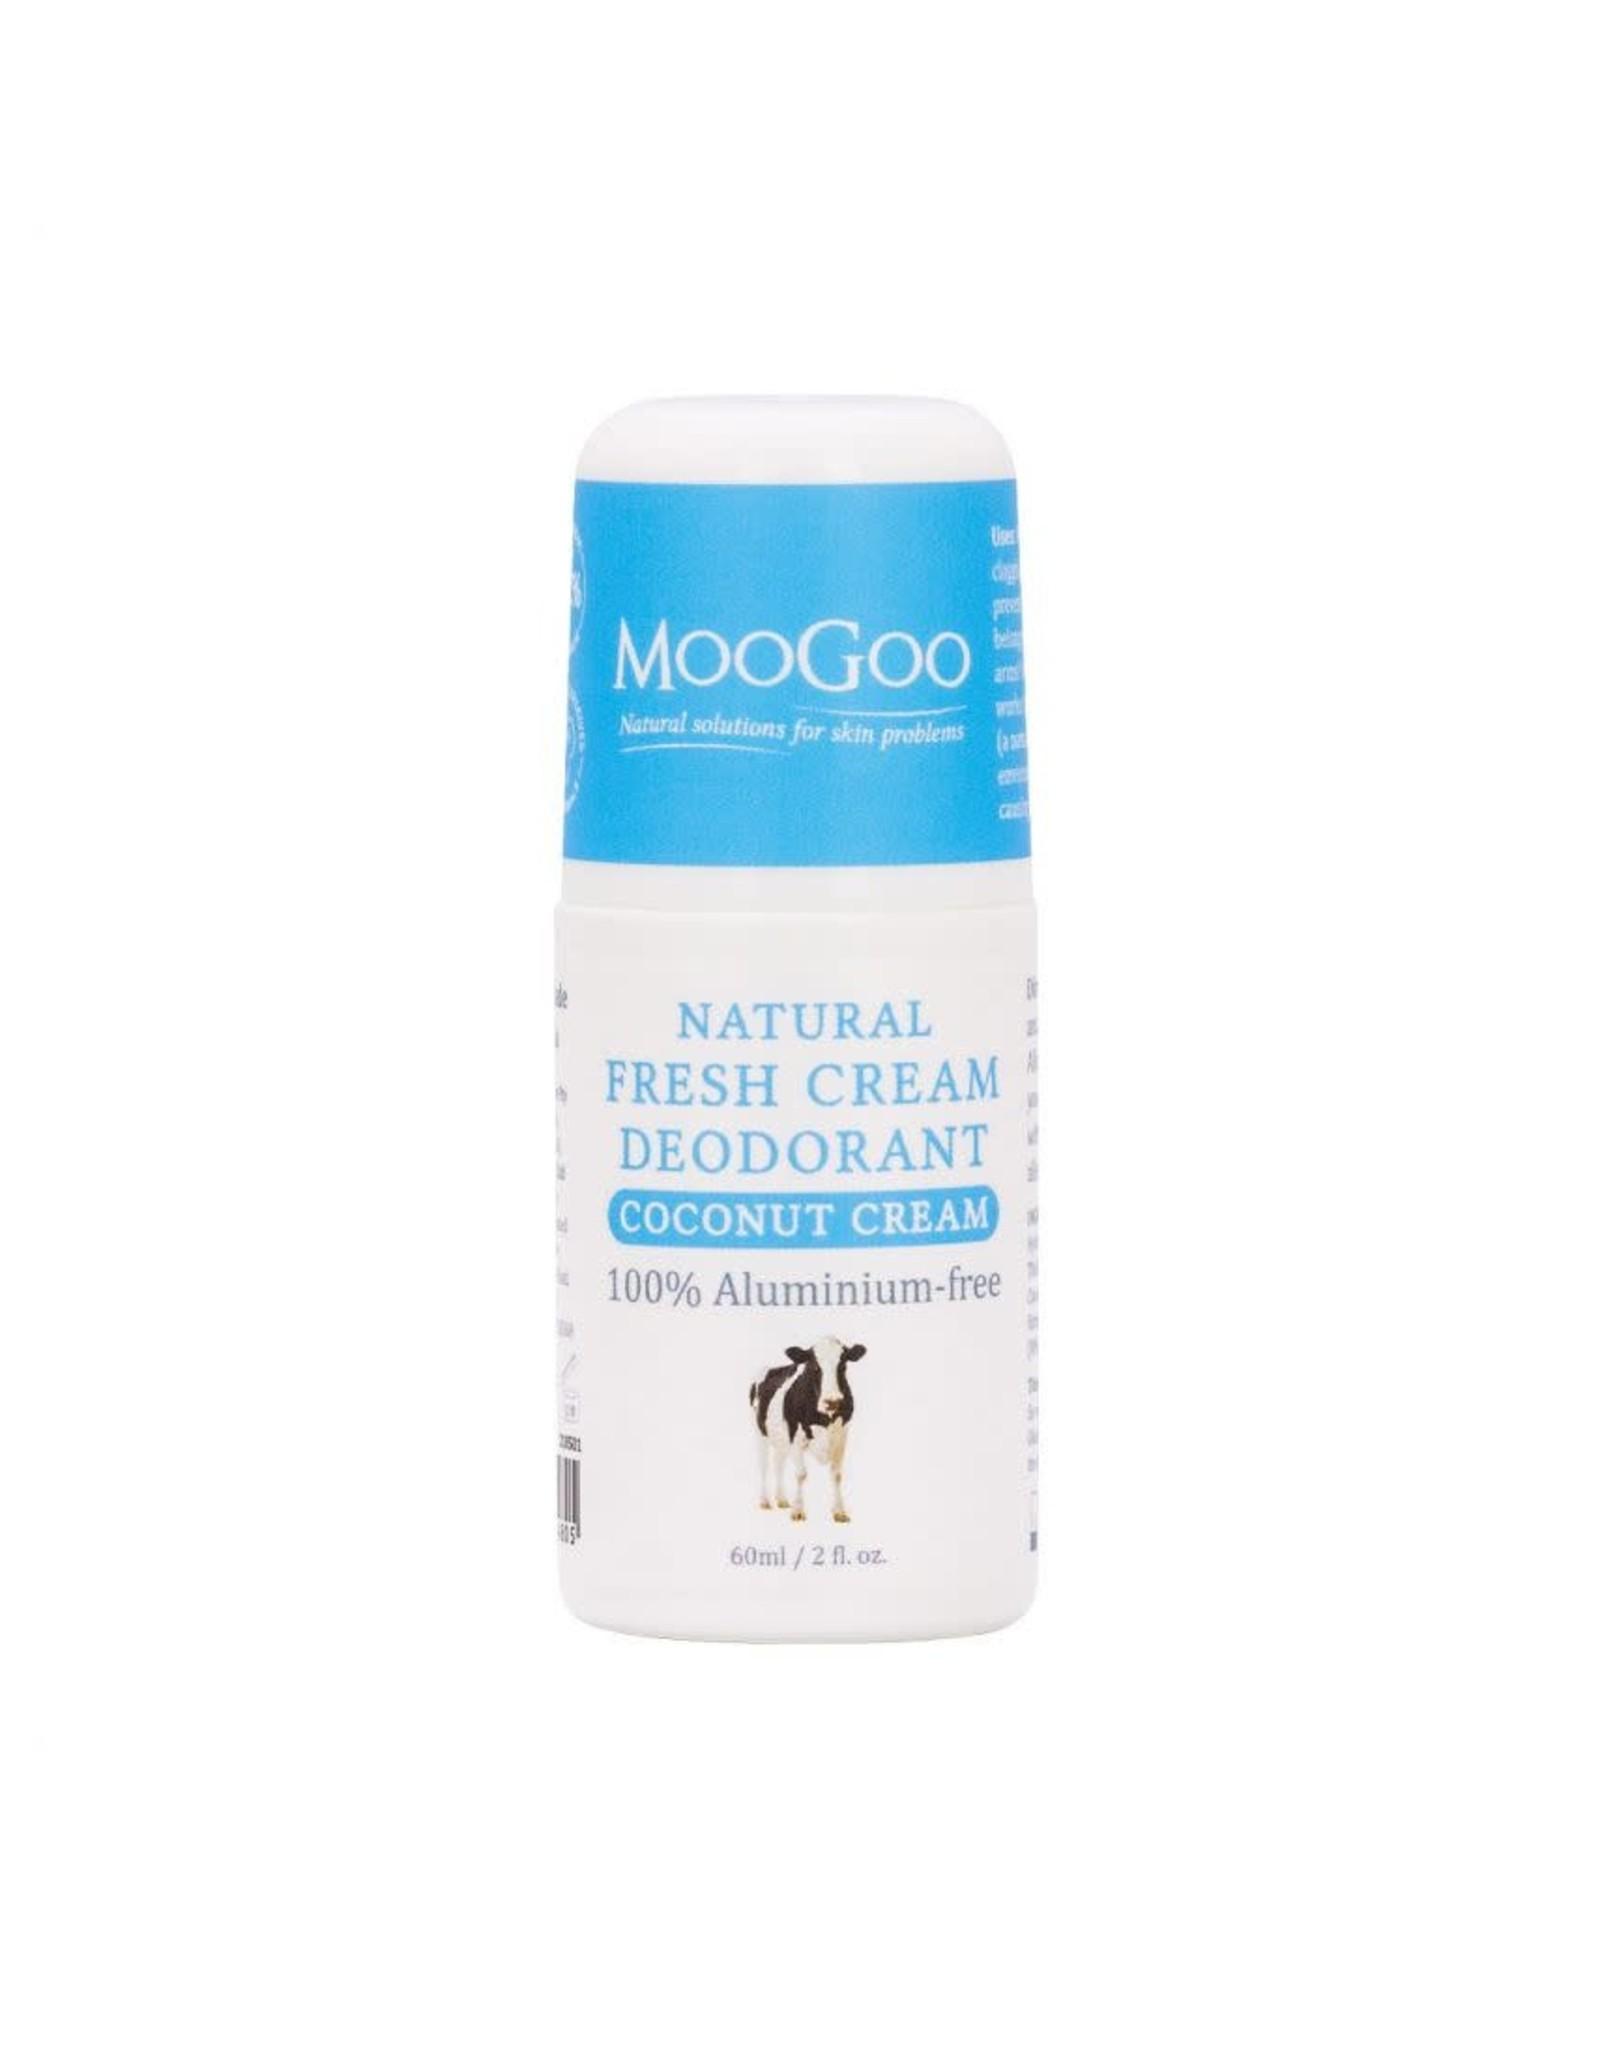 Moogoo Fresh Cream Deodorant - Coconut Cream 60ml